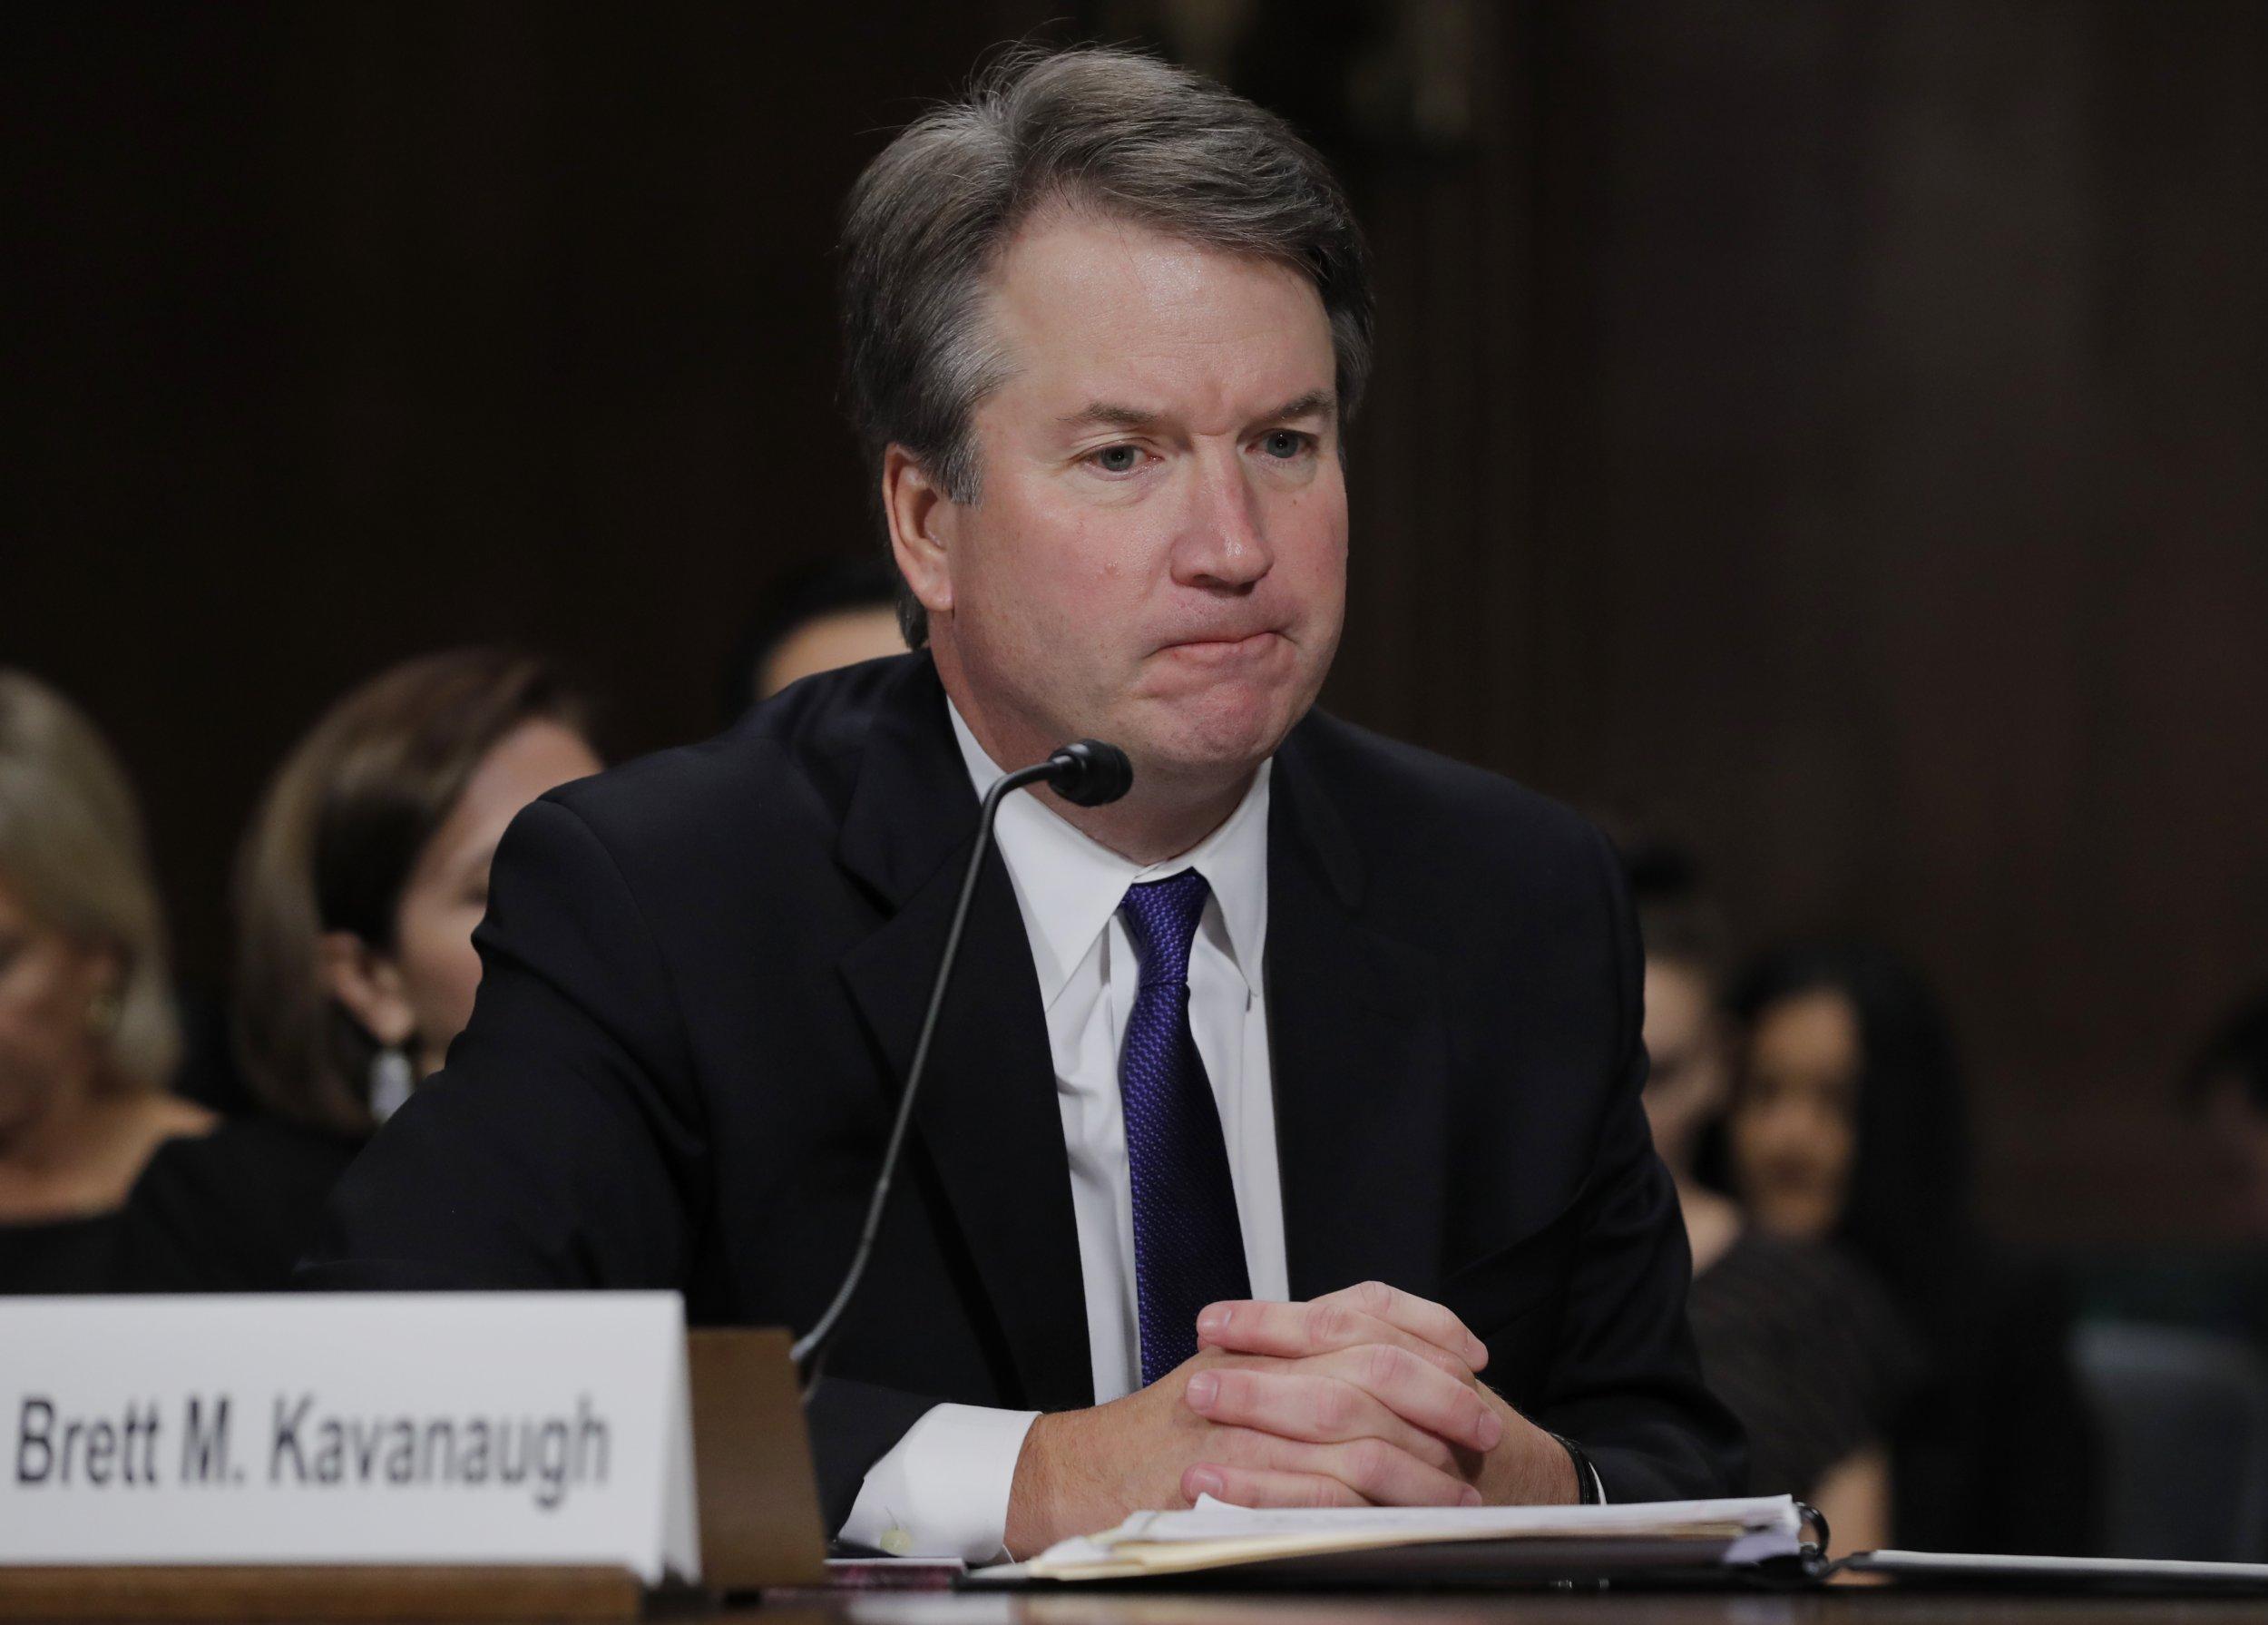 impeach Kavanaugh after official supreme court